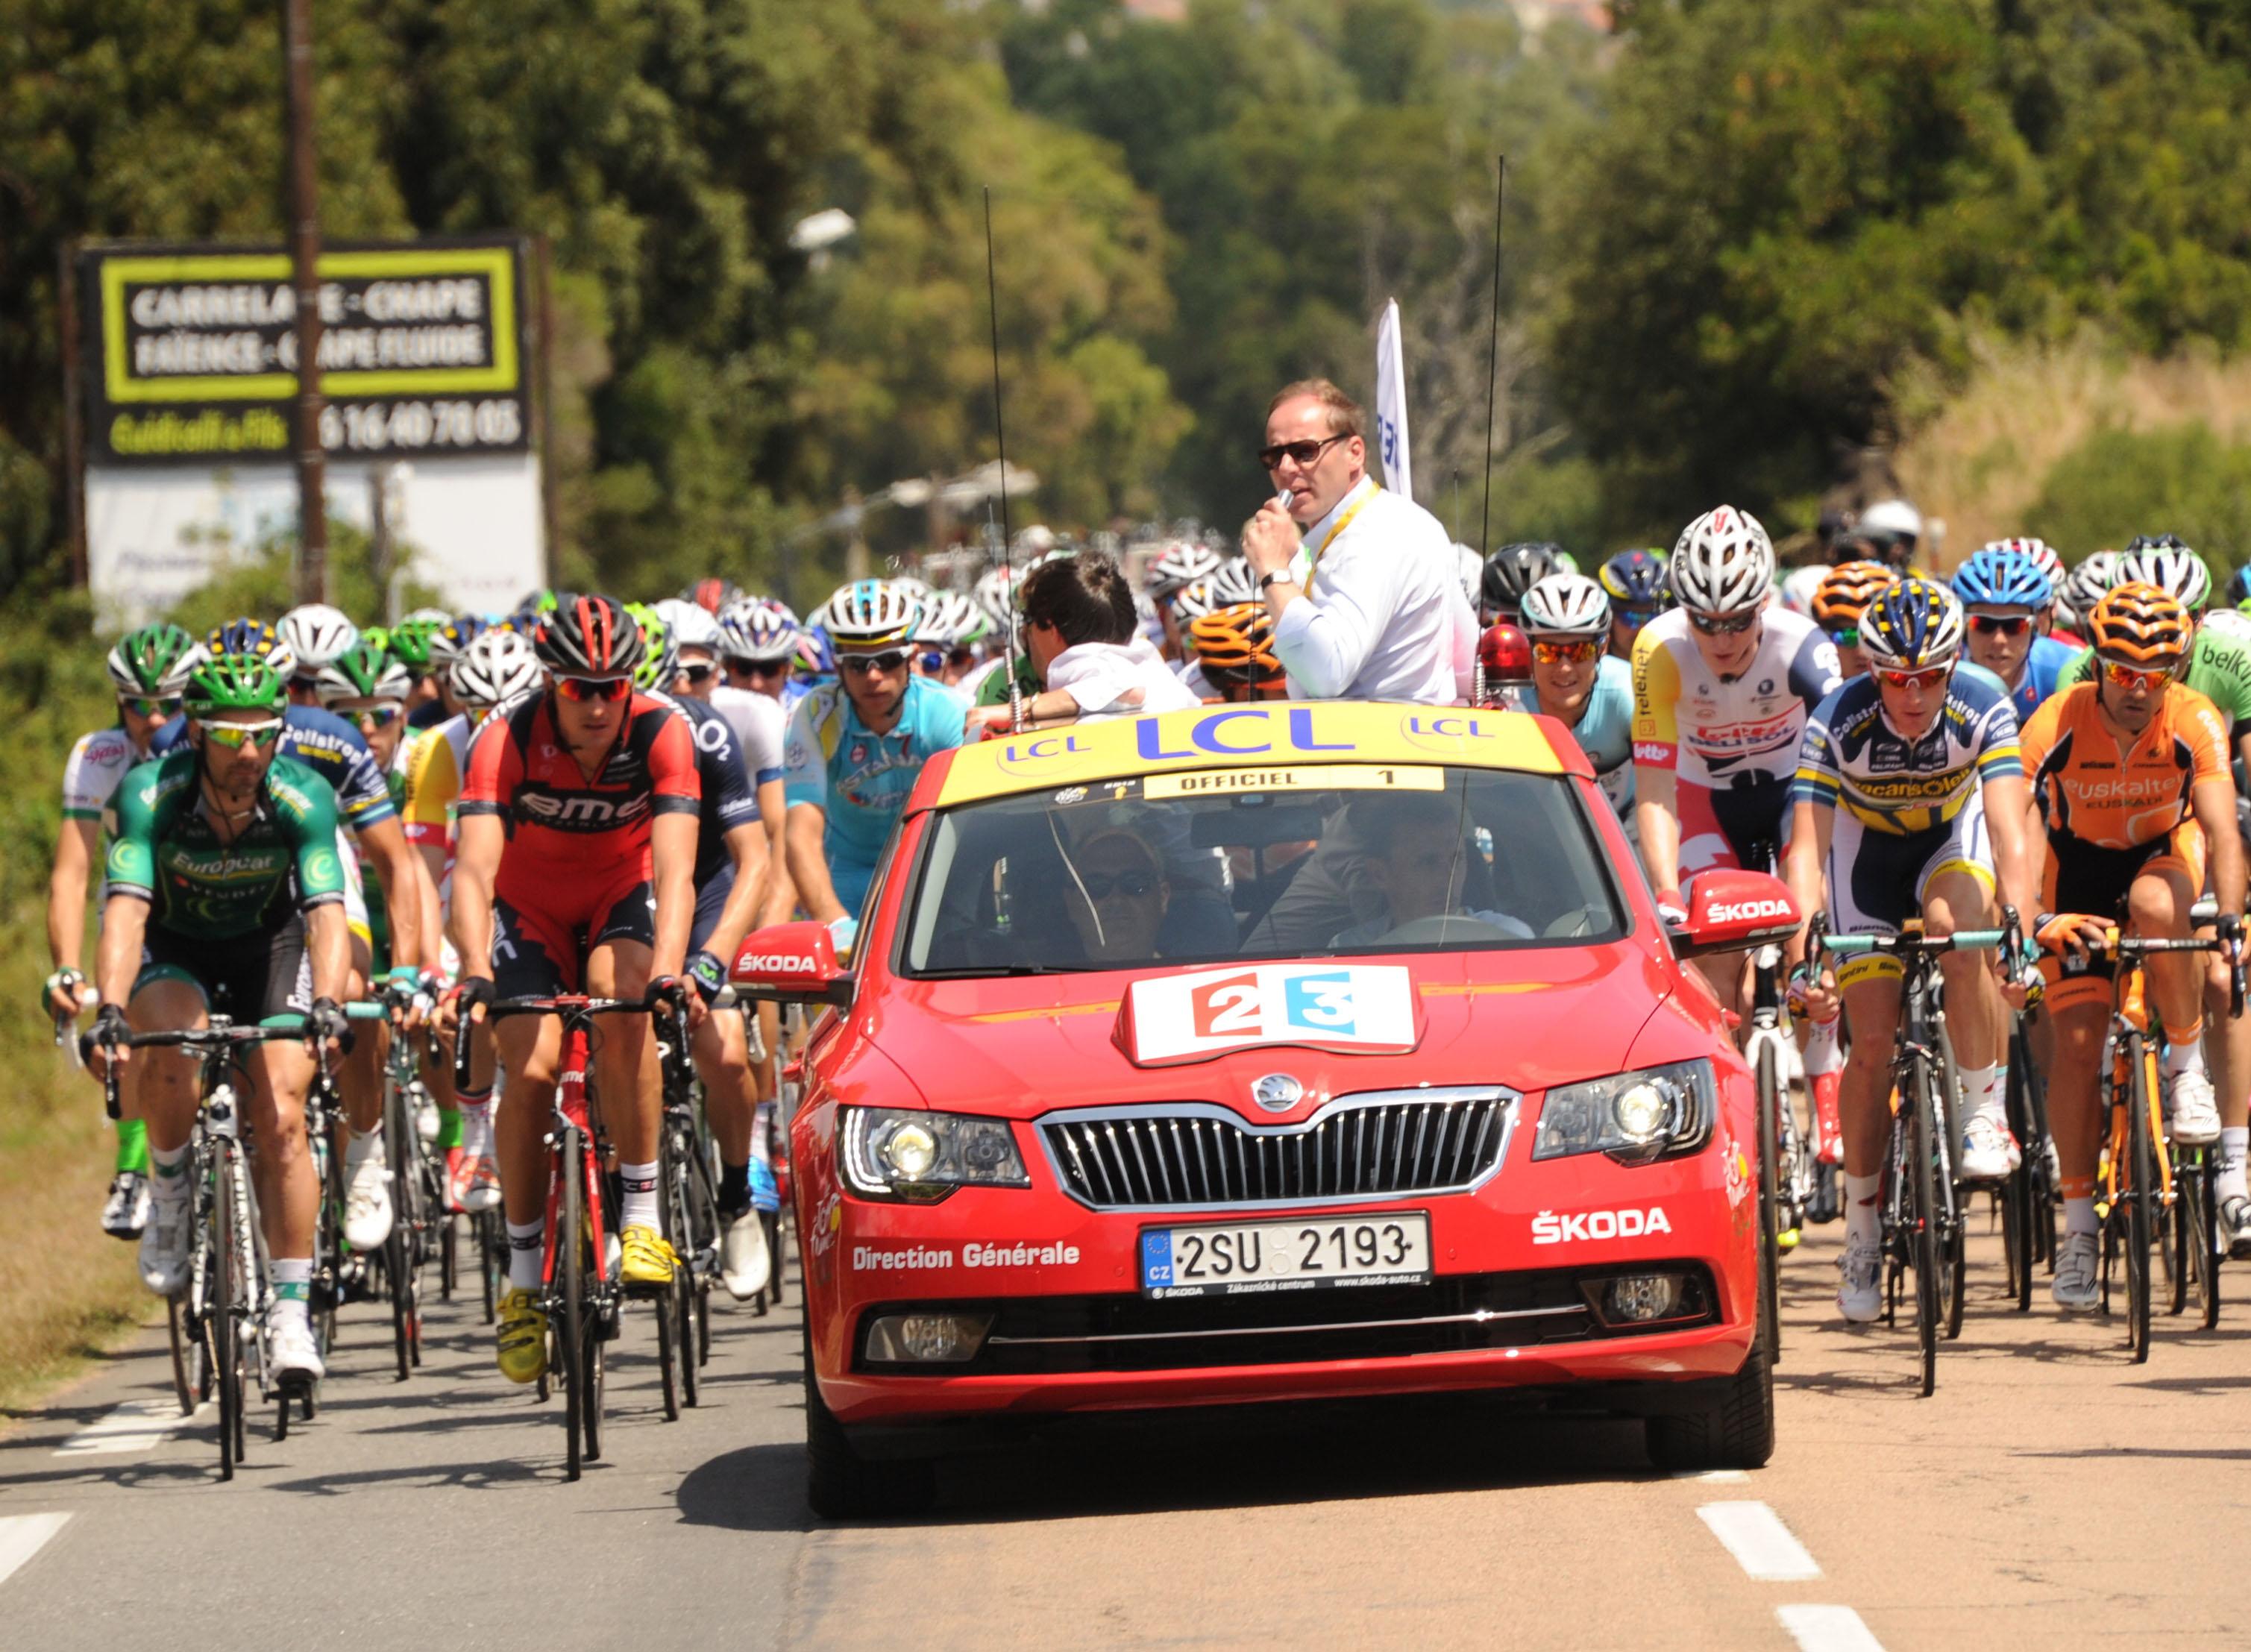 neuer_Skoda_Superb_Premiere_Tour_de_France